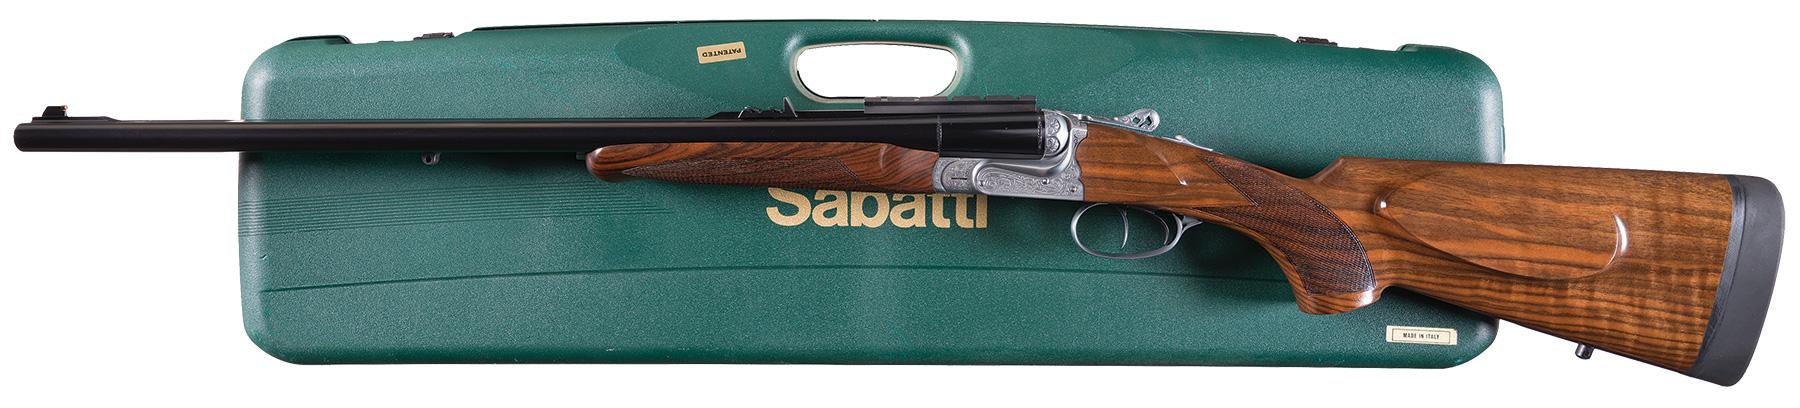 Sabatti Big Game Double Rifle 470 NE